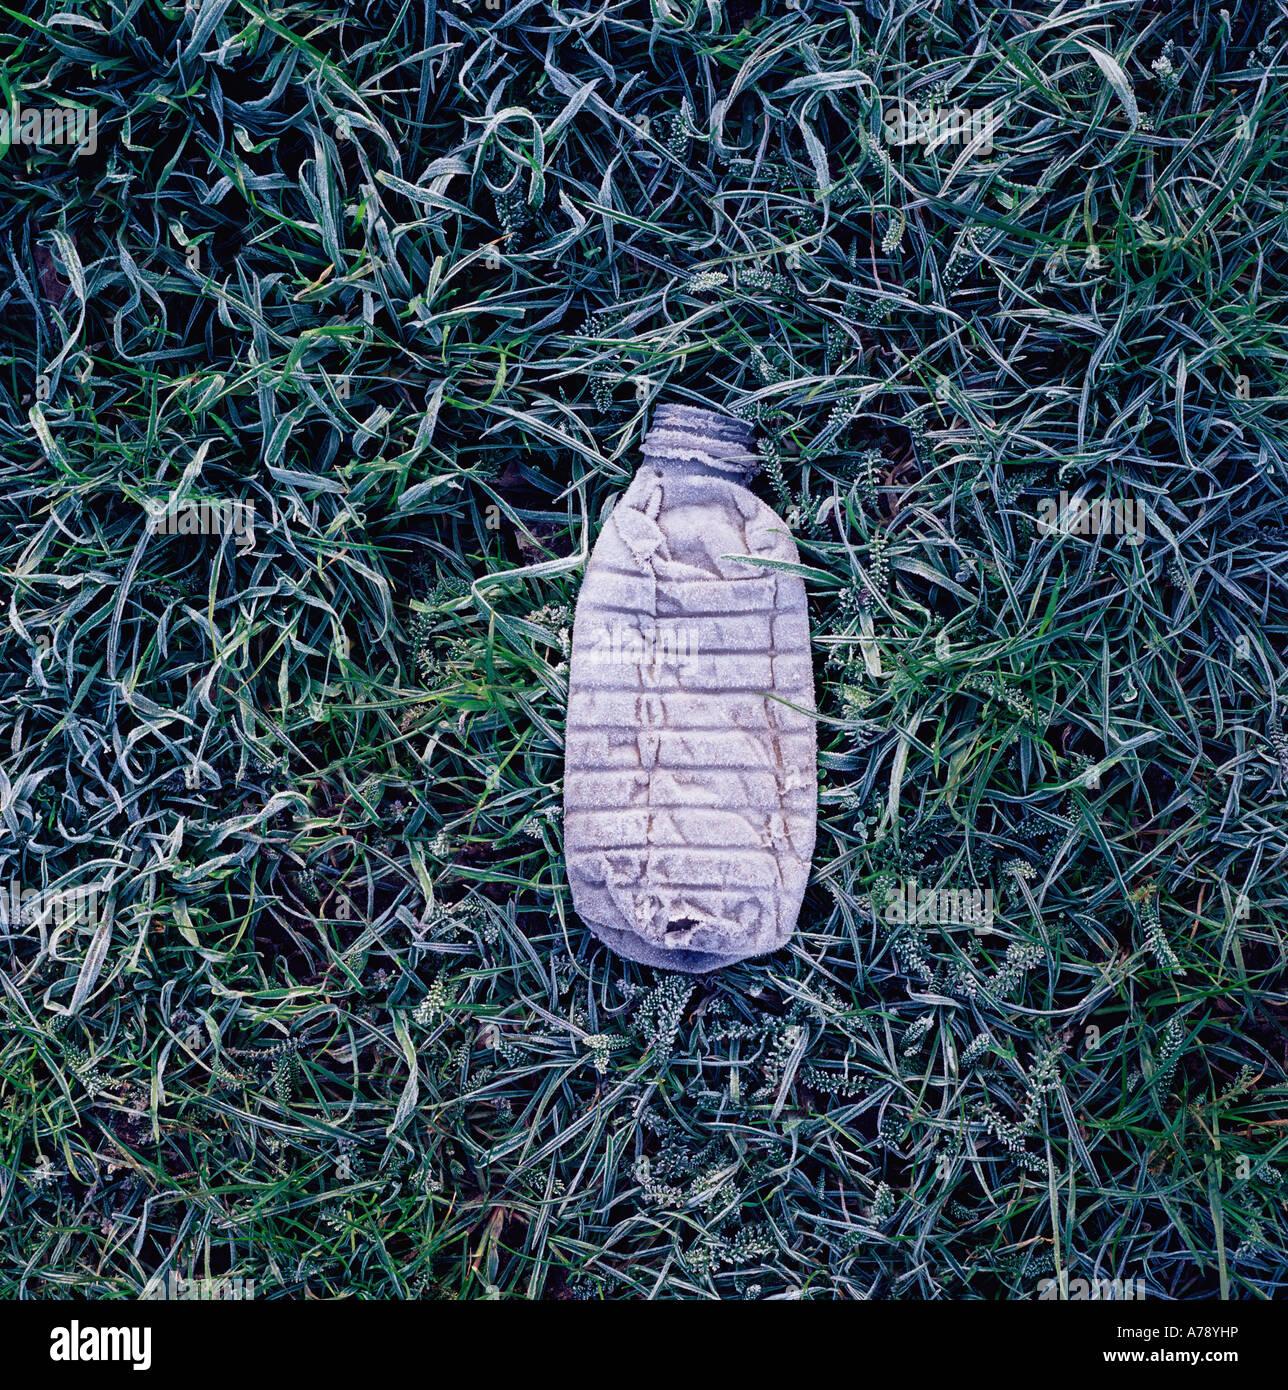 Plastic bottle on the ground - Stock Image